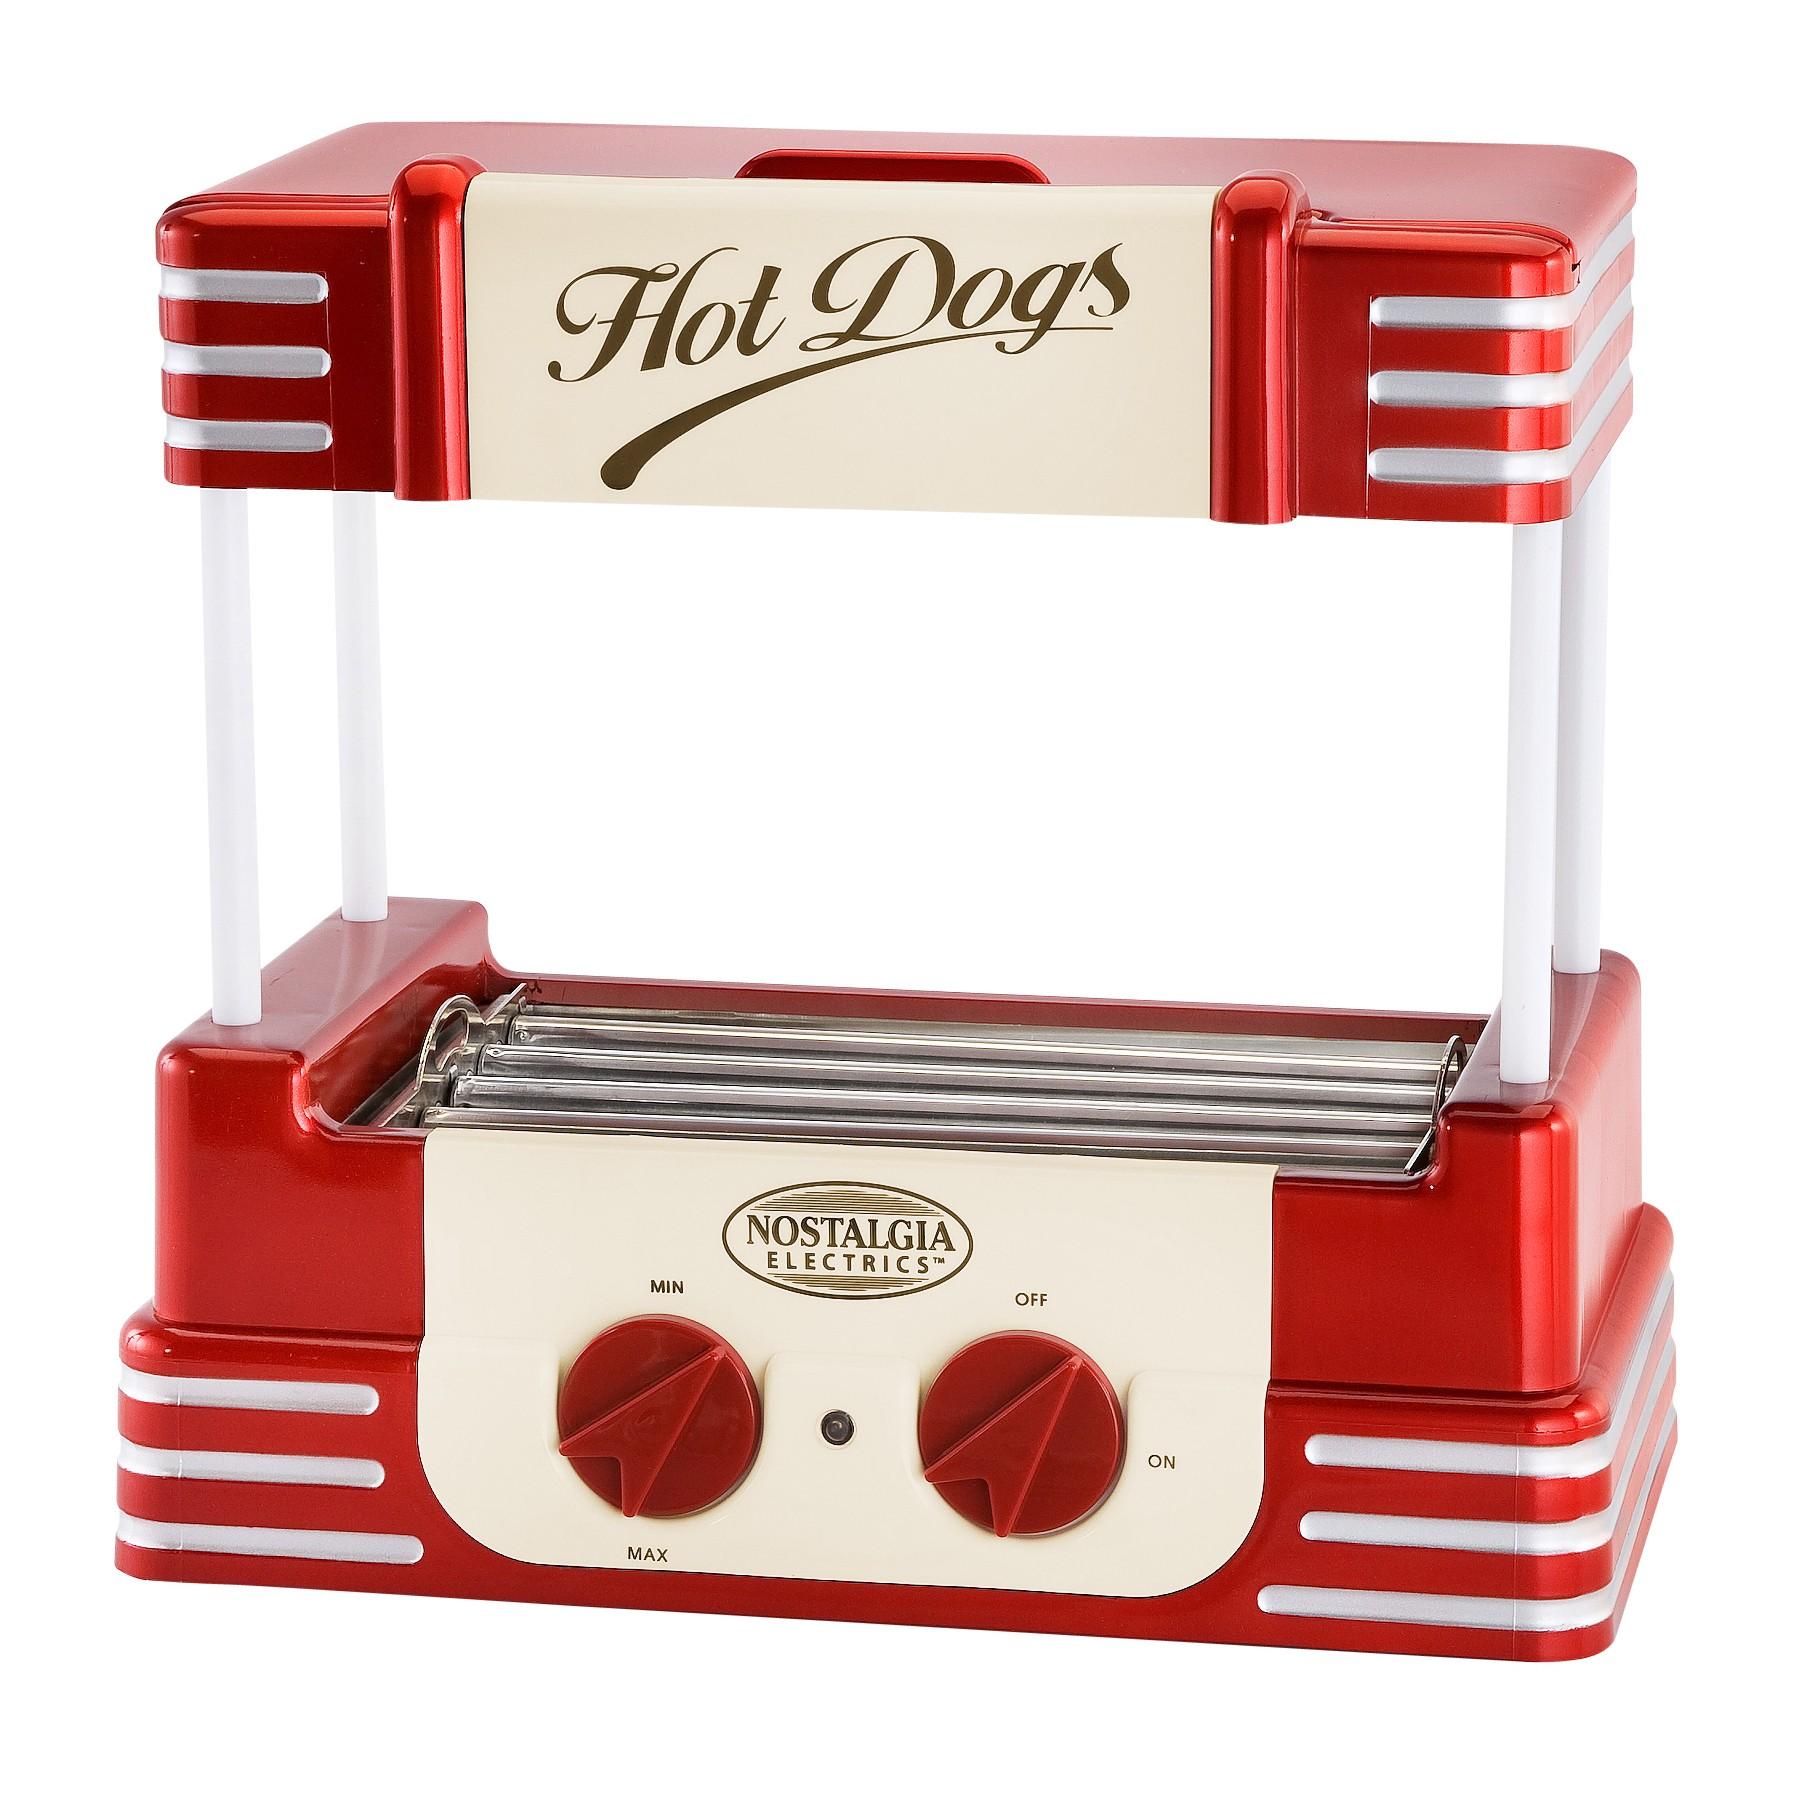 Nostalgia Electrics RHD-800 Retro Hot Dog Roller EMG742